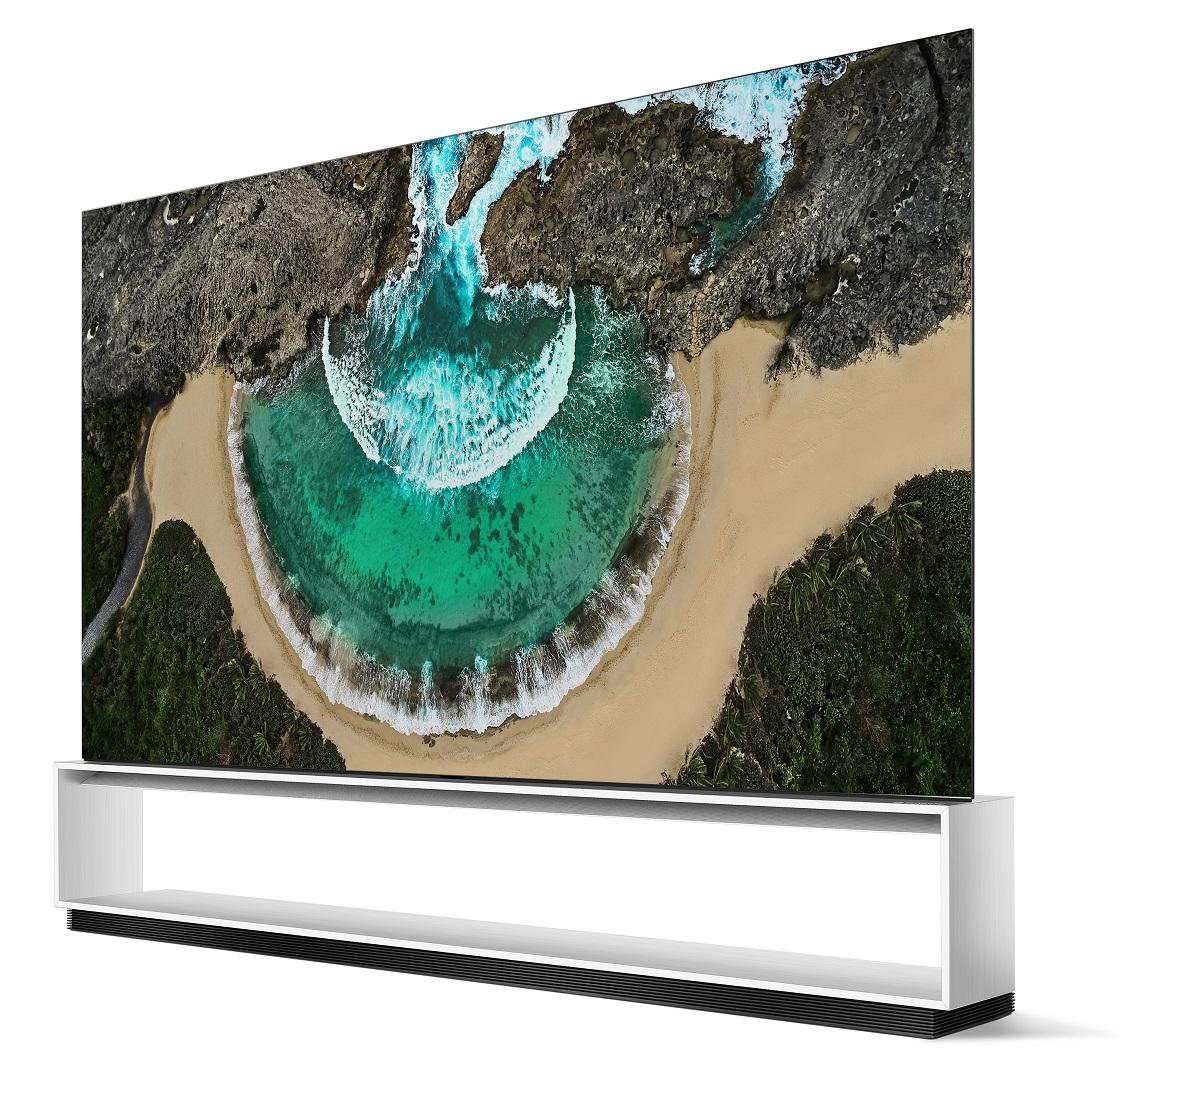 LG 시그니처 올레드 8K 제품 이미지